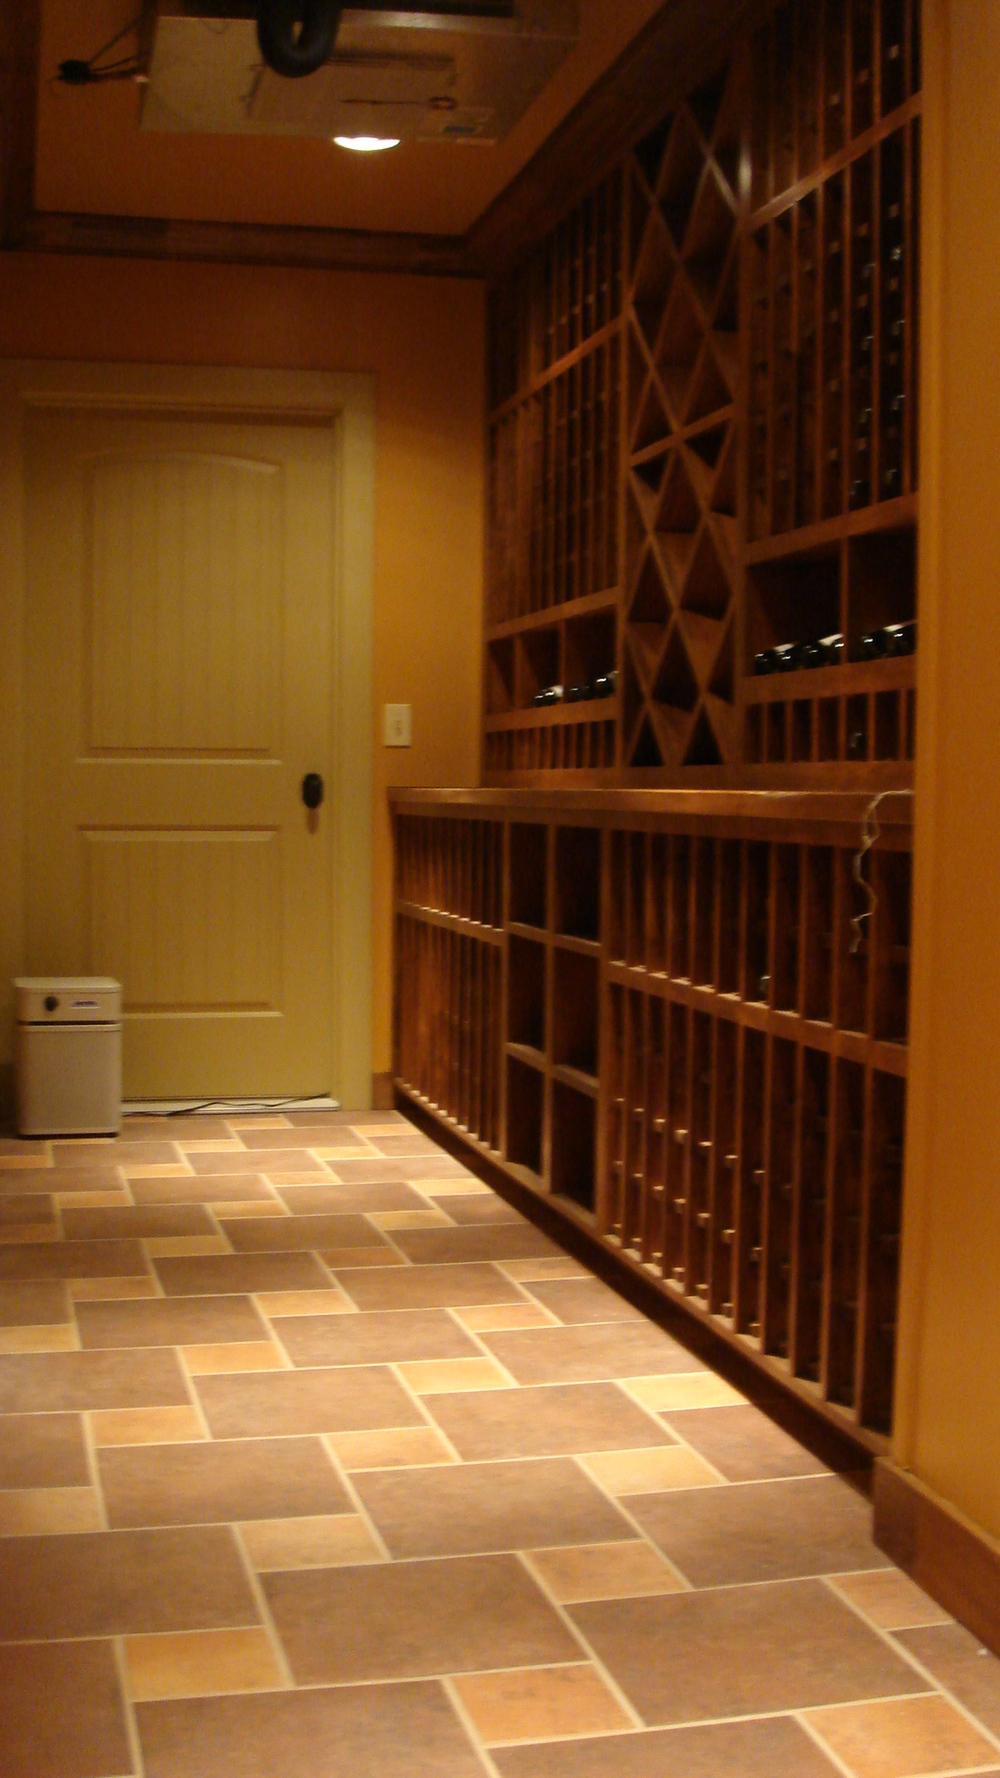 24 Shearer wine cellar.JPG